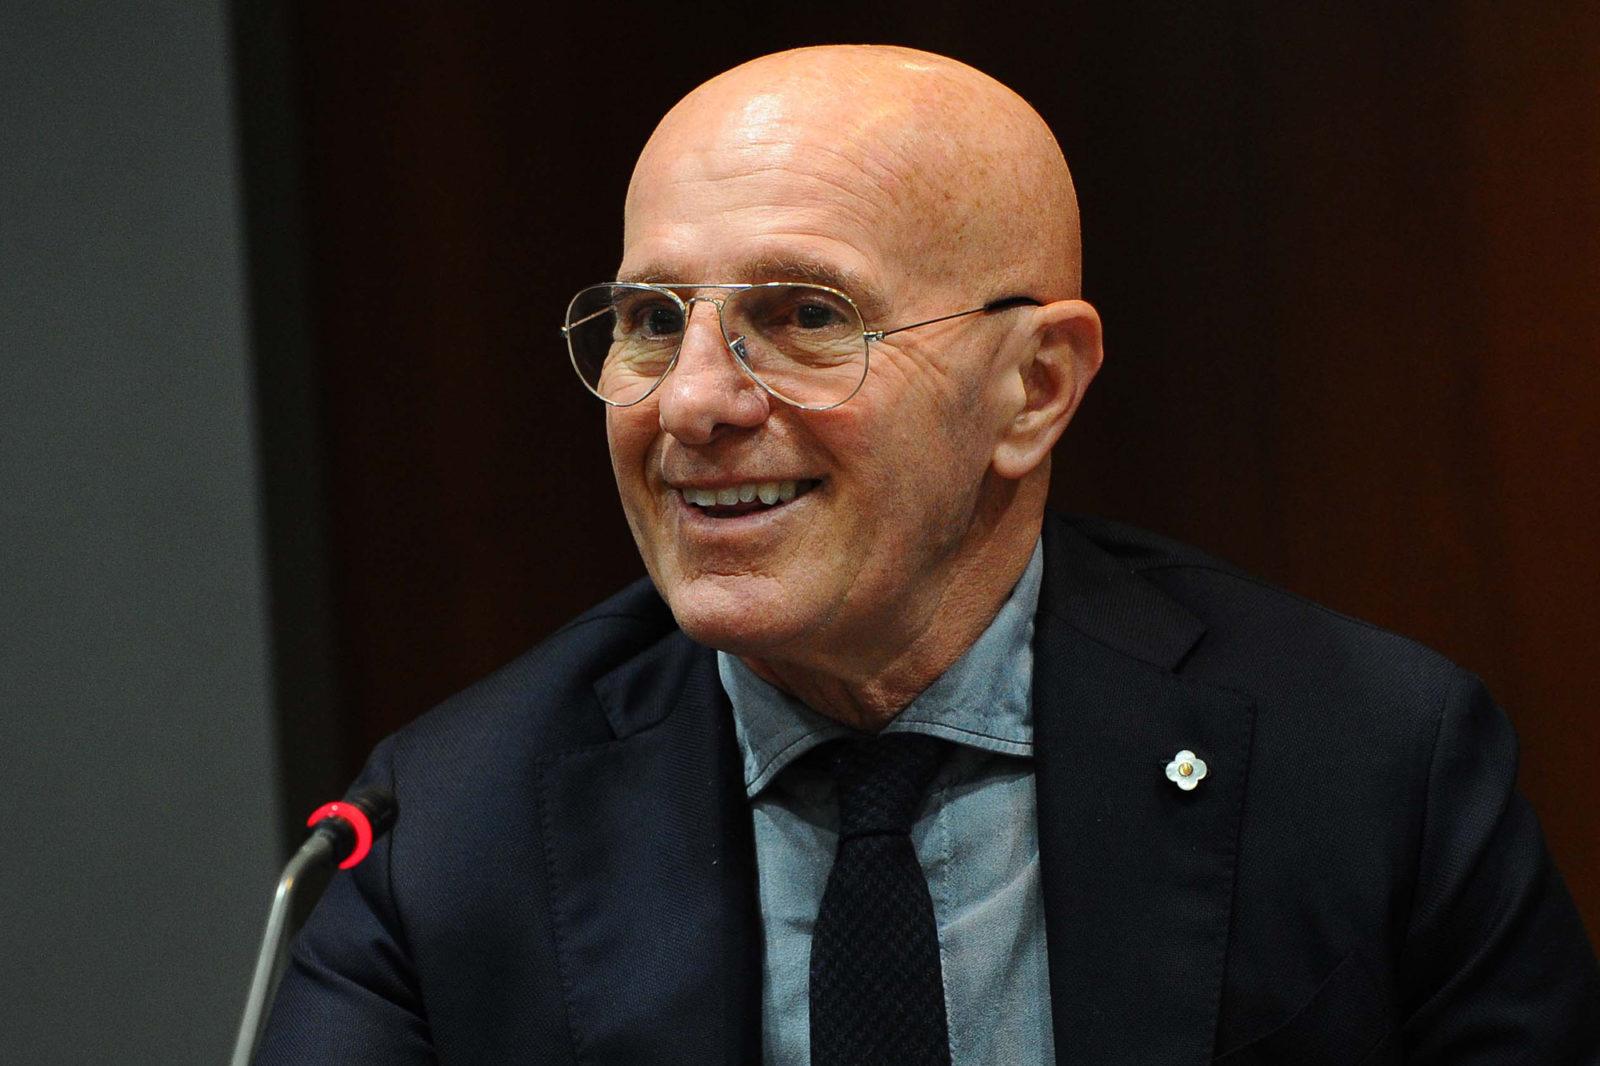 L'ex allenatore del Milan Arrigo Sacchi